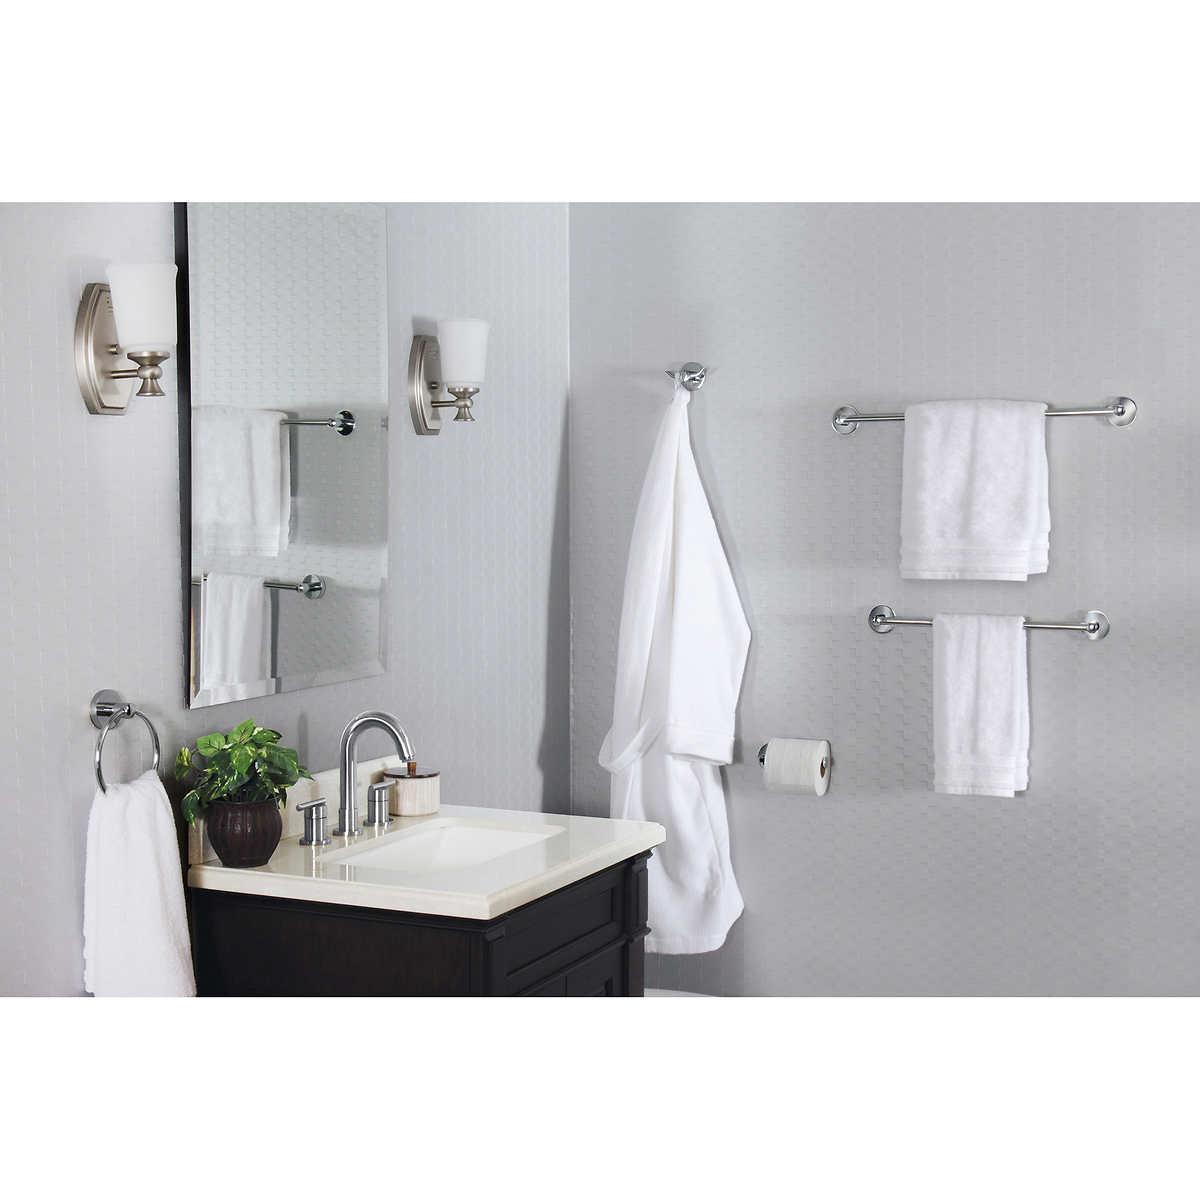 Bathroom Accessories Costco